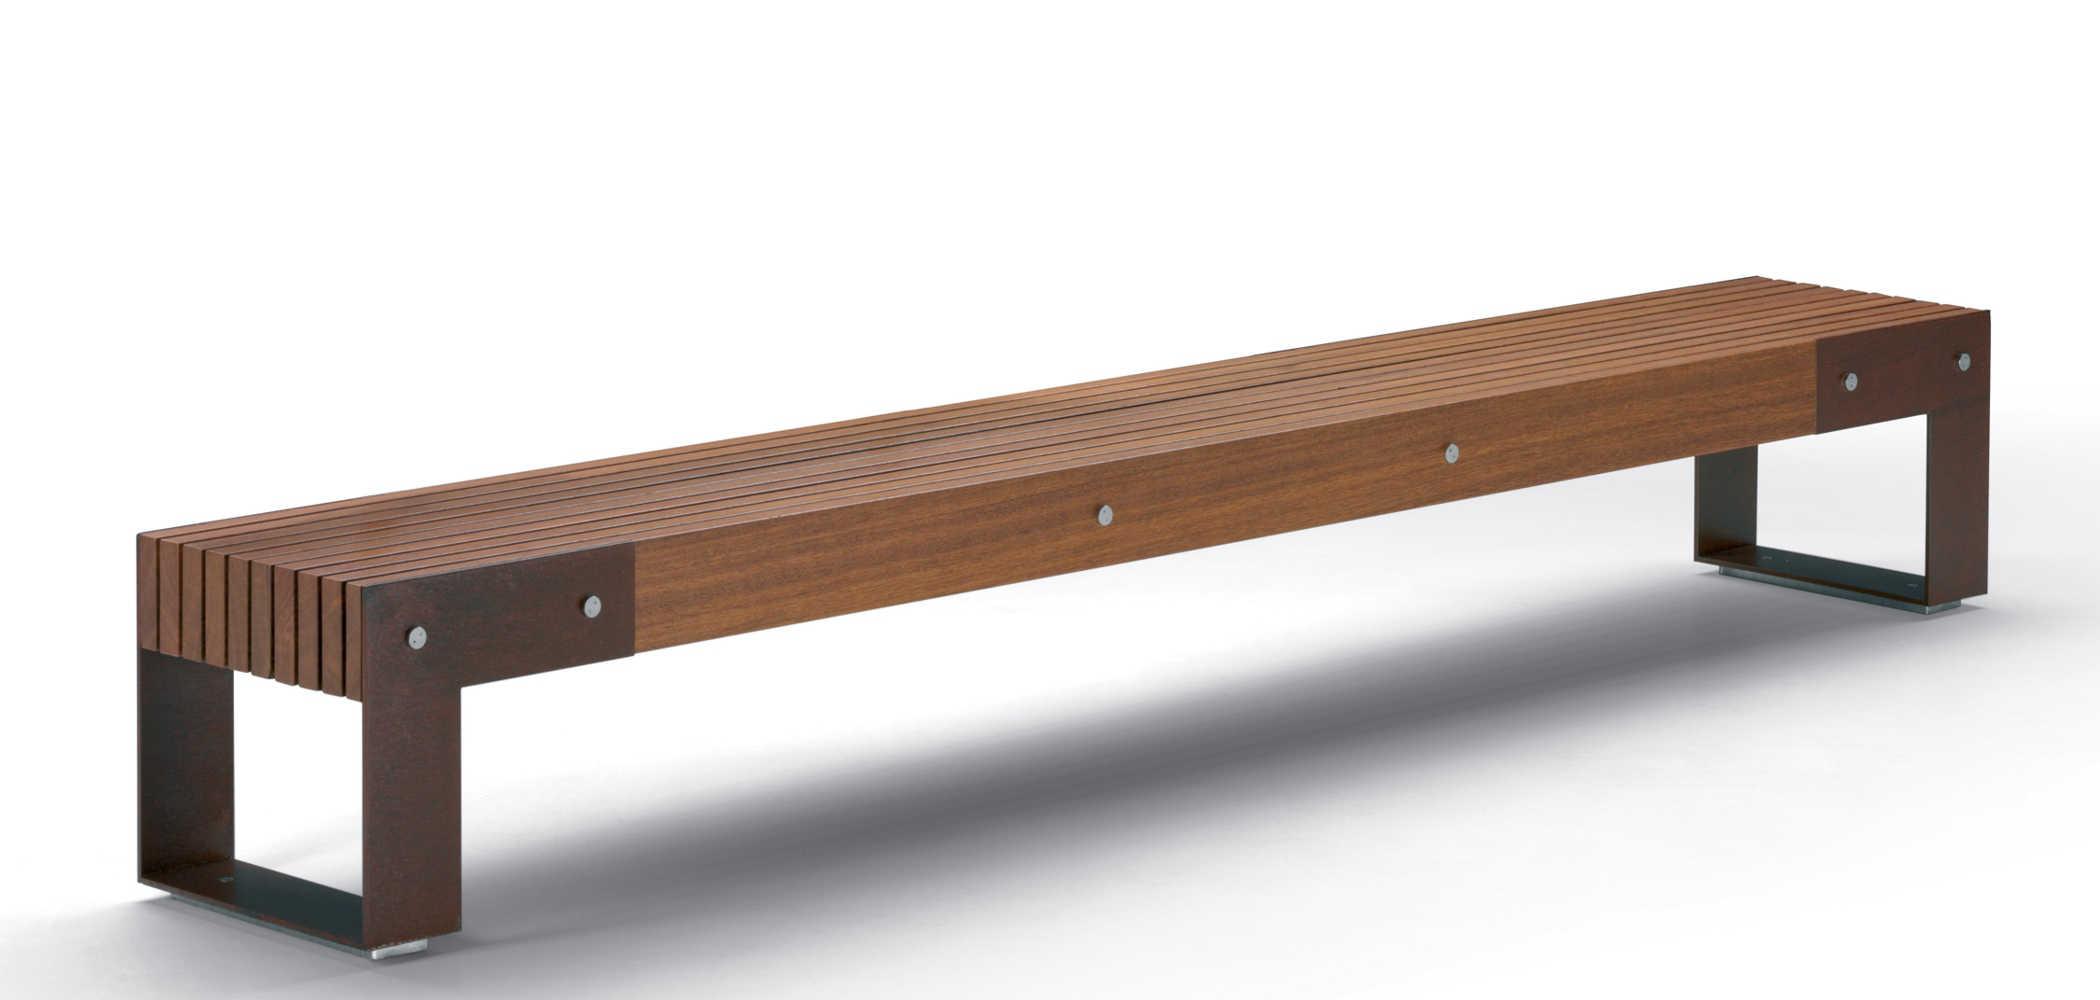 Panchine Da Esterno Design.Benches Ideas Lt Metalco